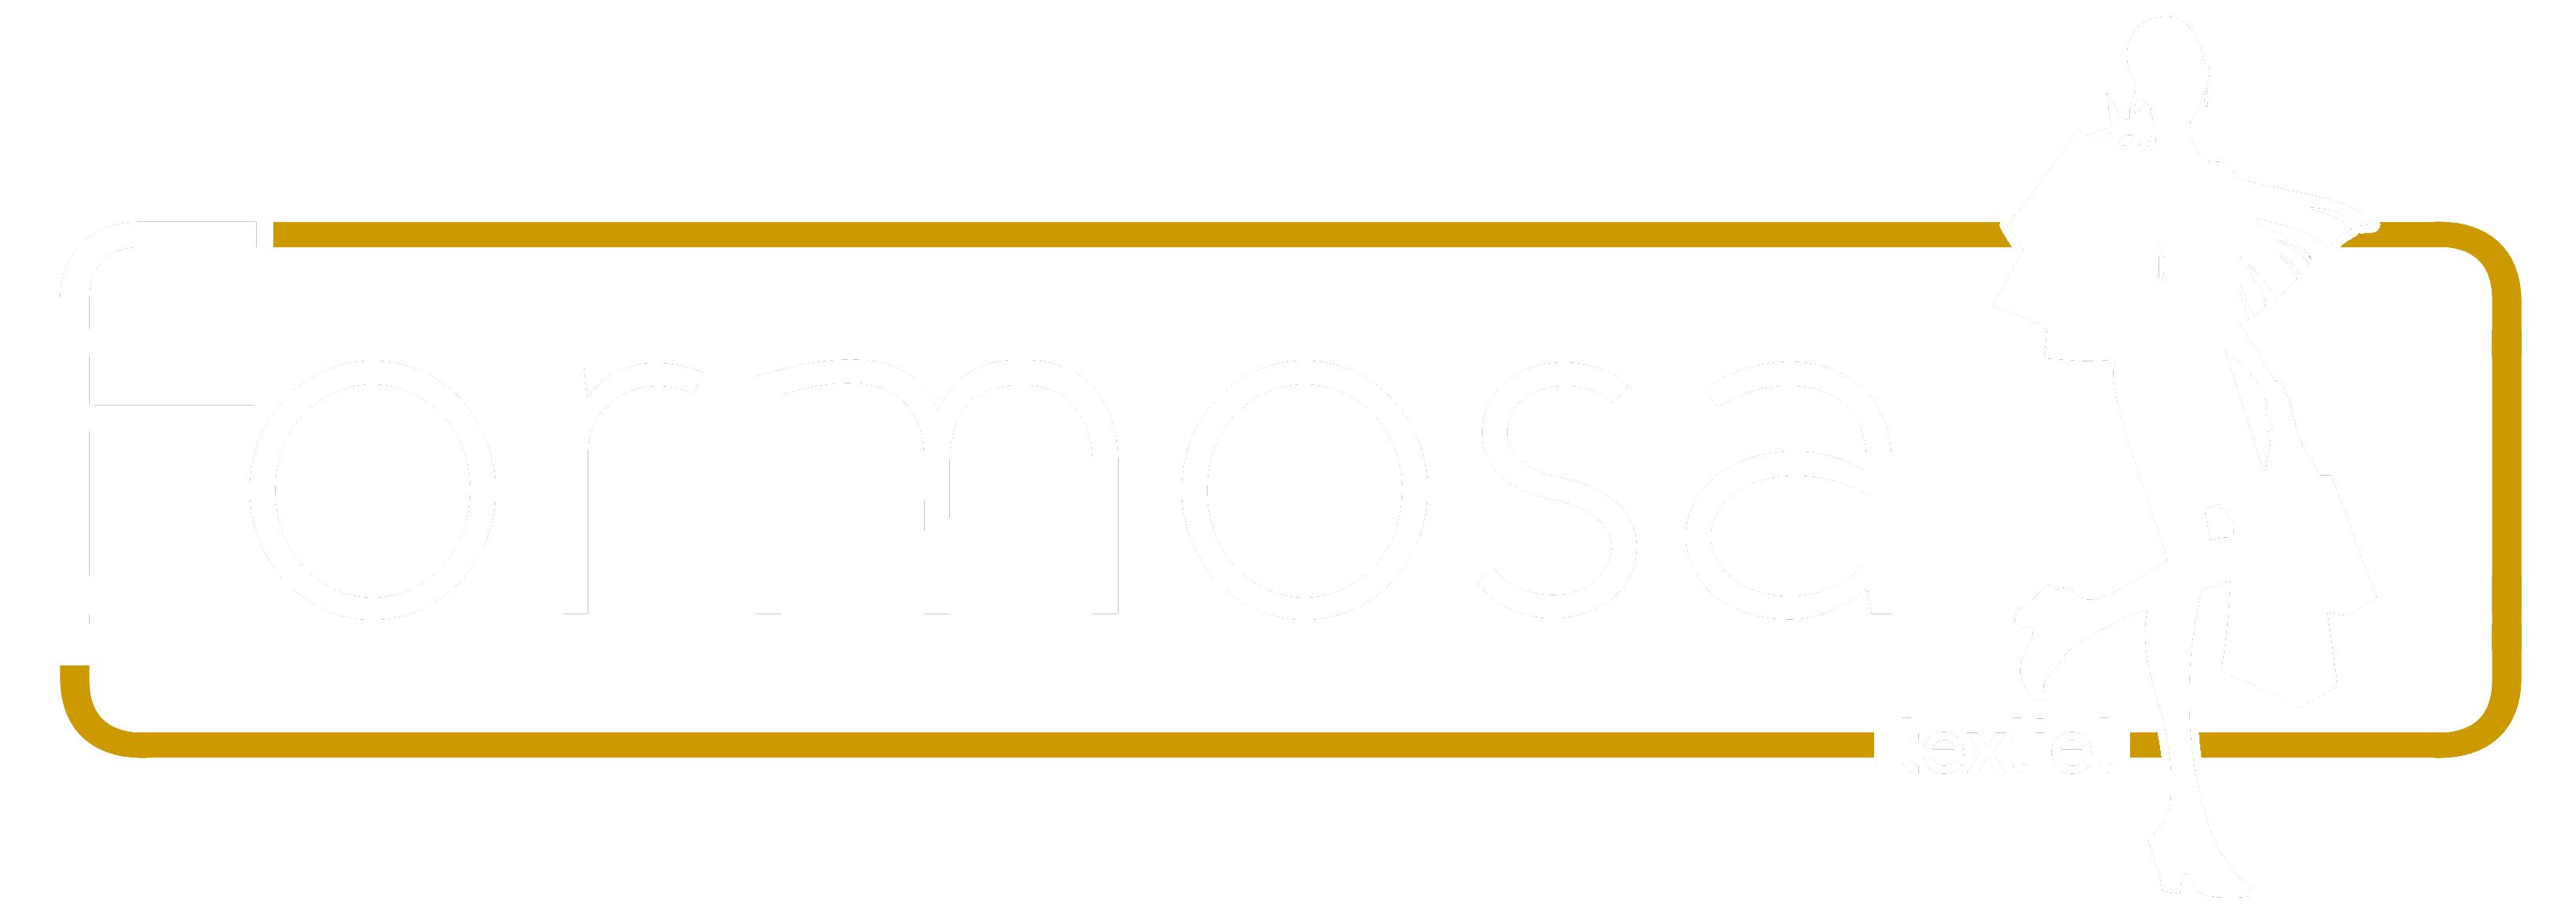 Woody webshop – Formosa Textiel